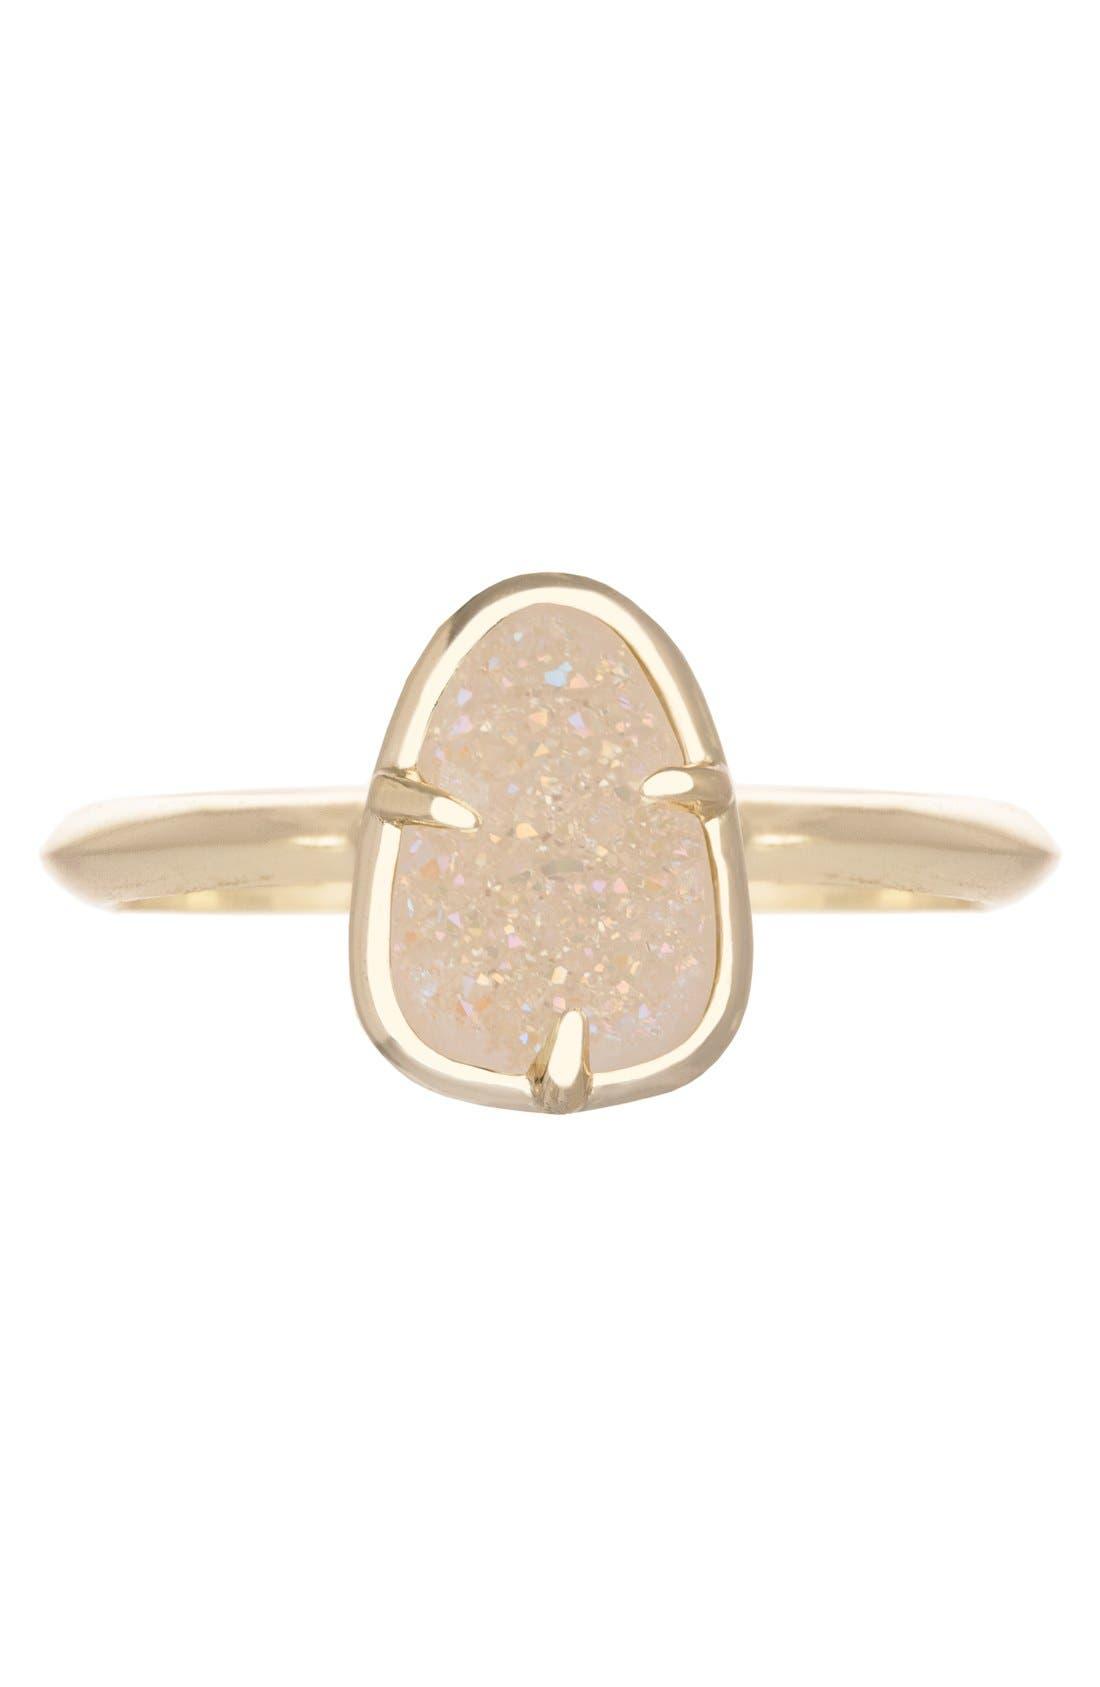 Alternate Image 1 Selected - Kendra Scott 'Haylee' Stone Ring